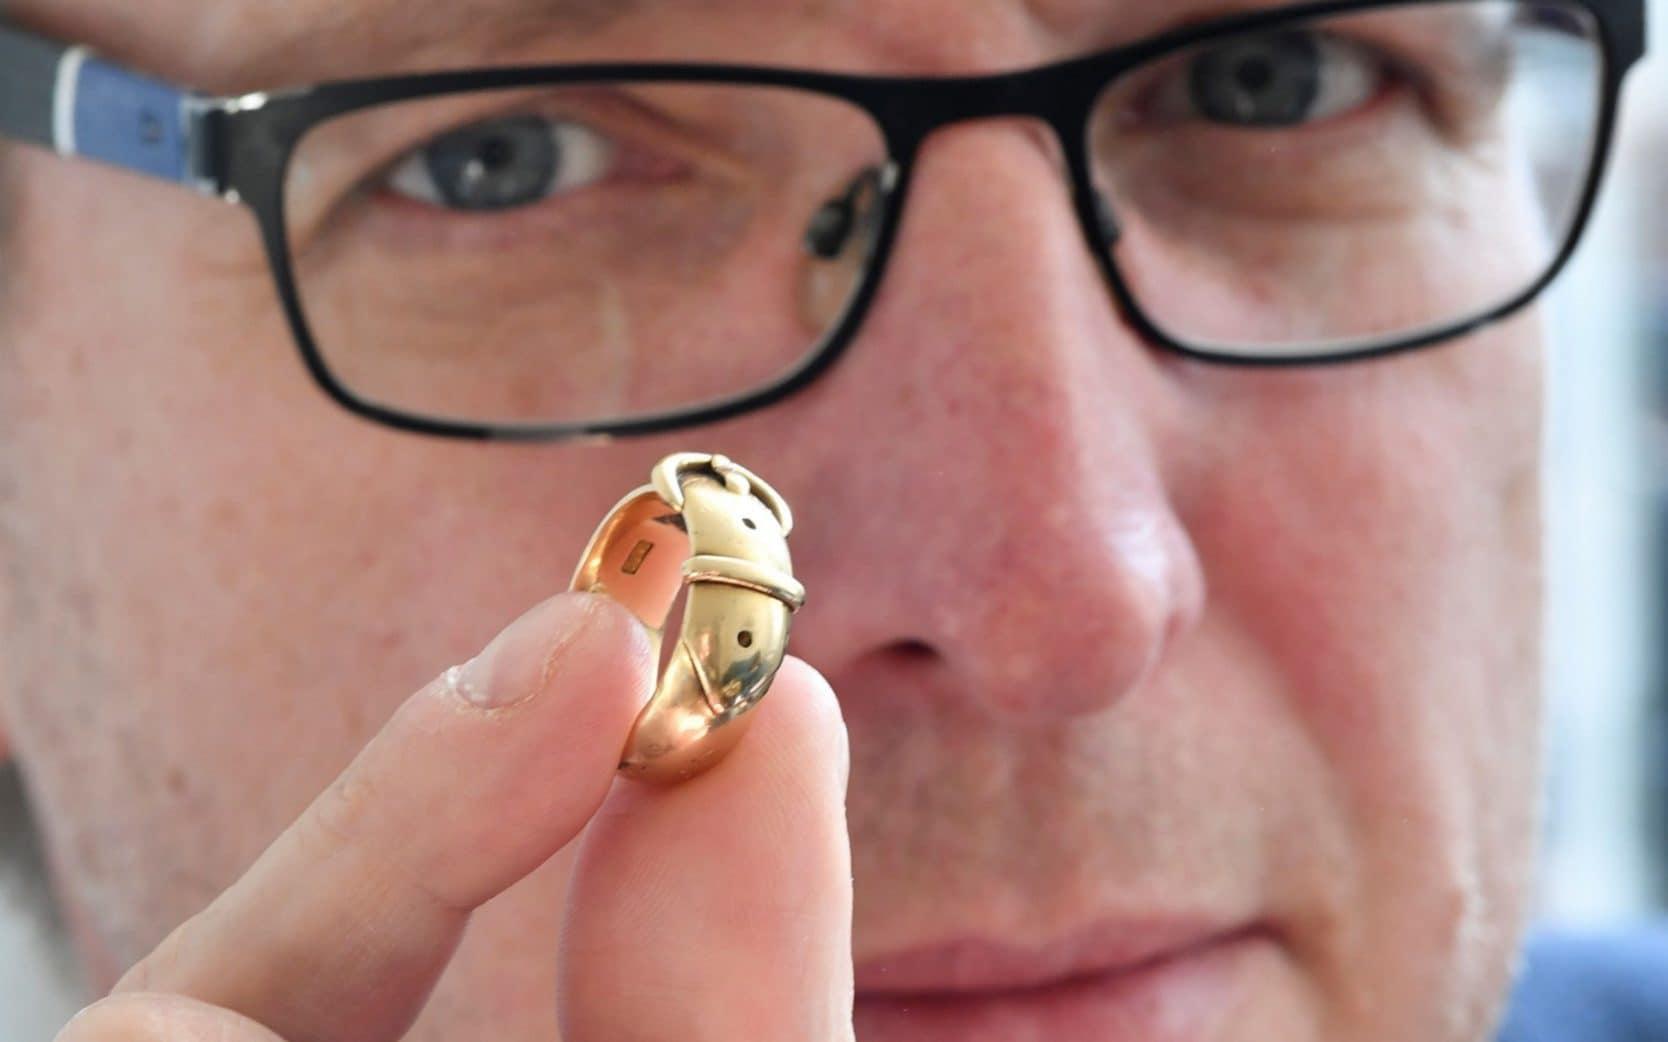 Кольцо Оскара Уайльда.